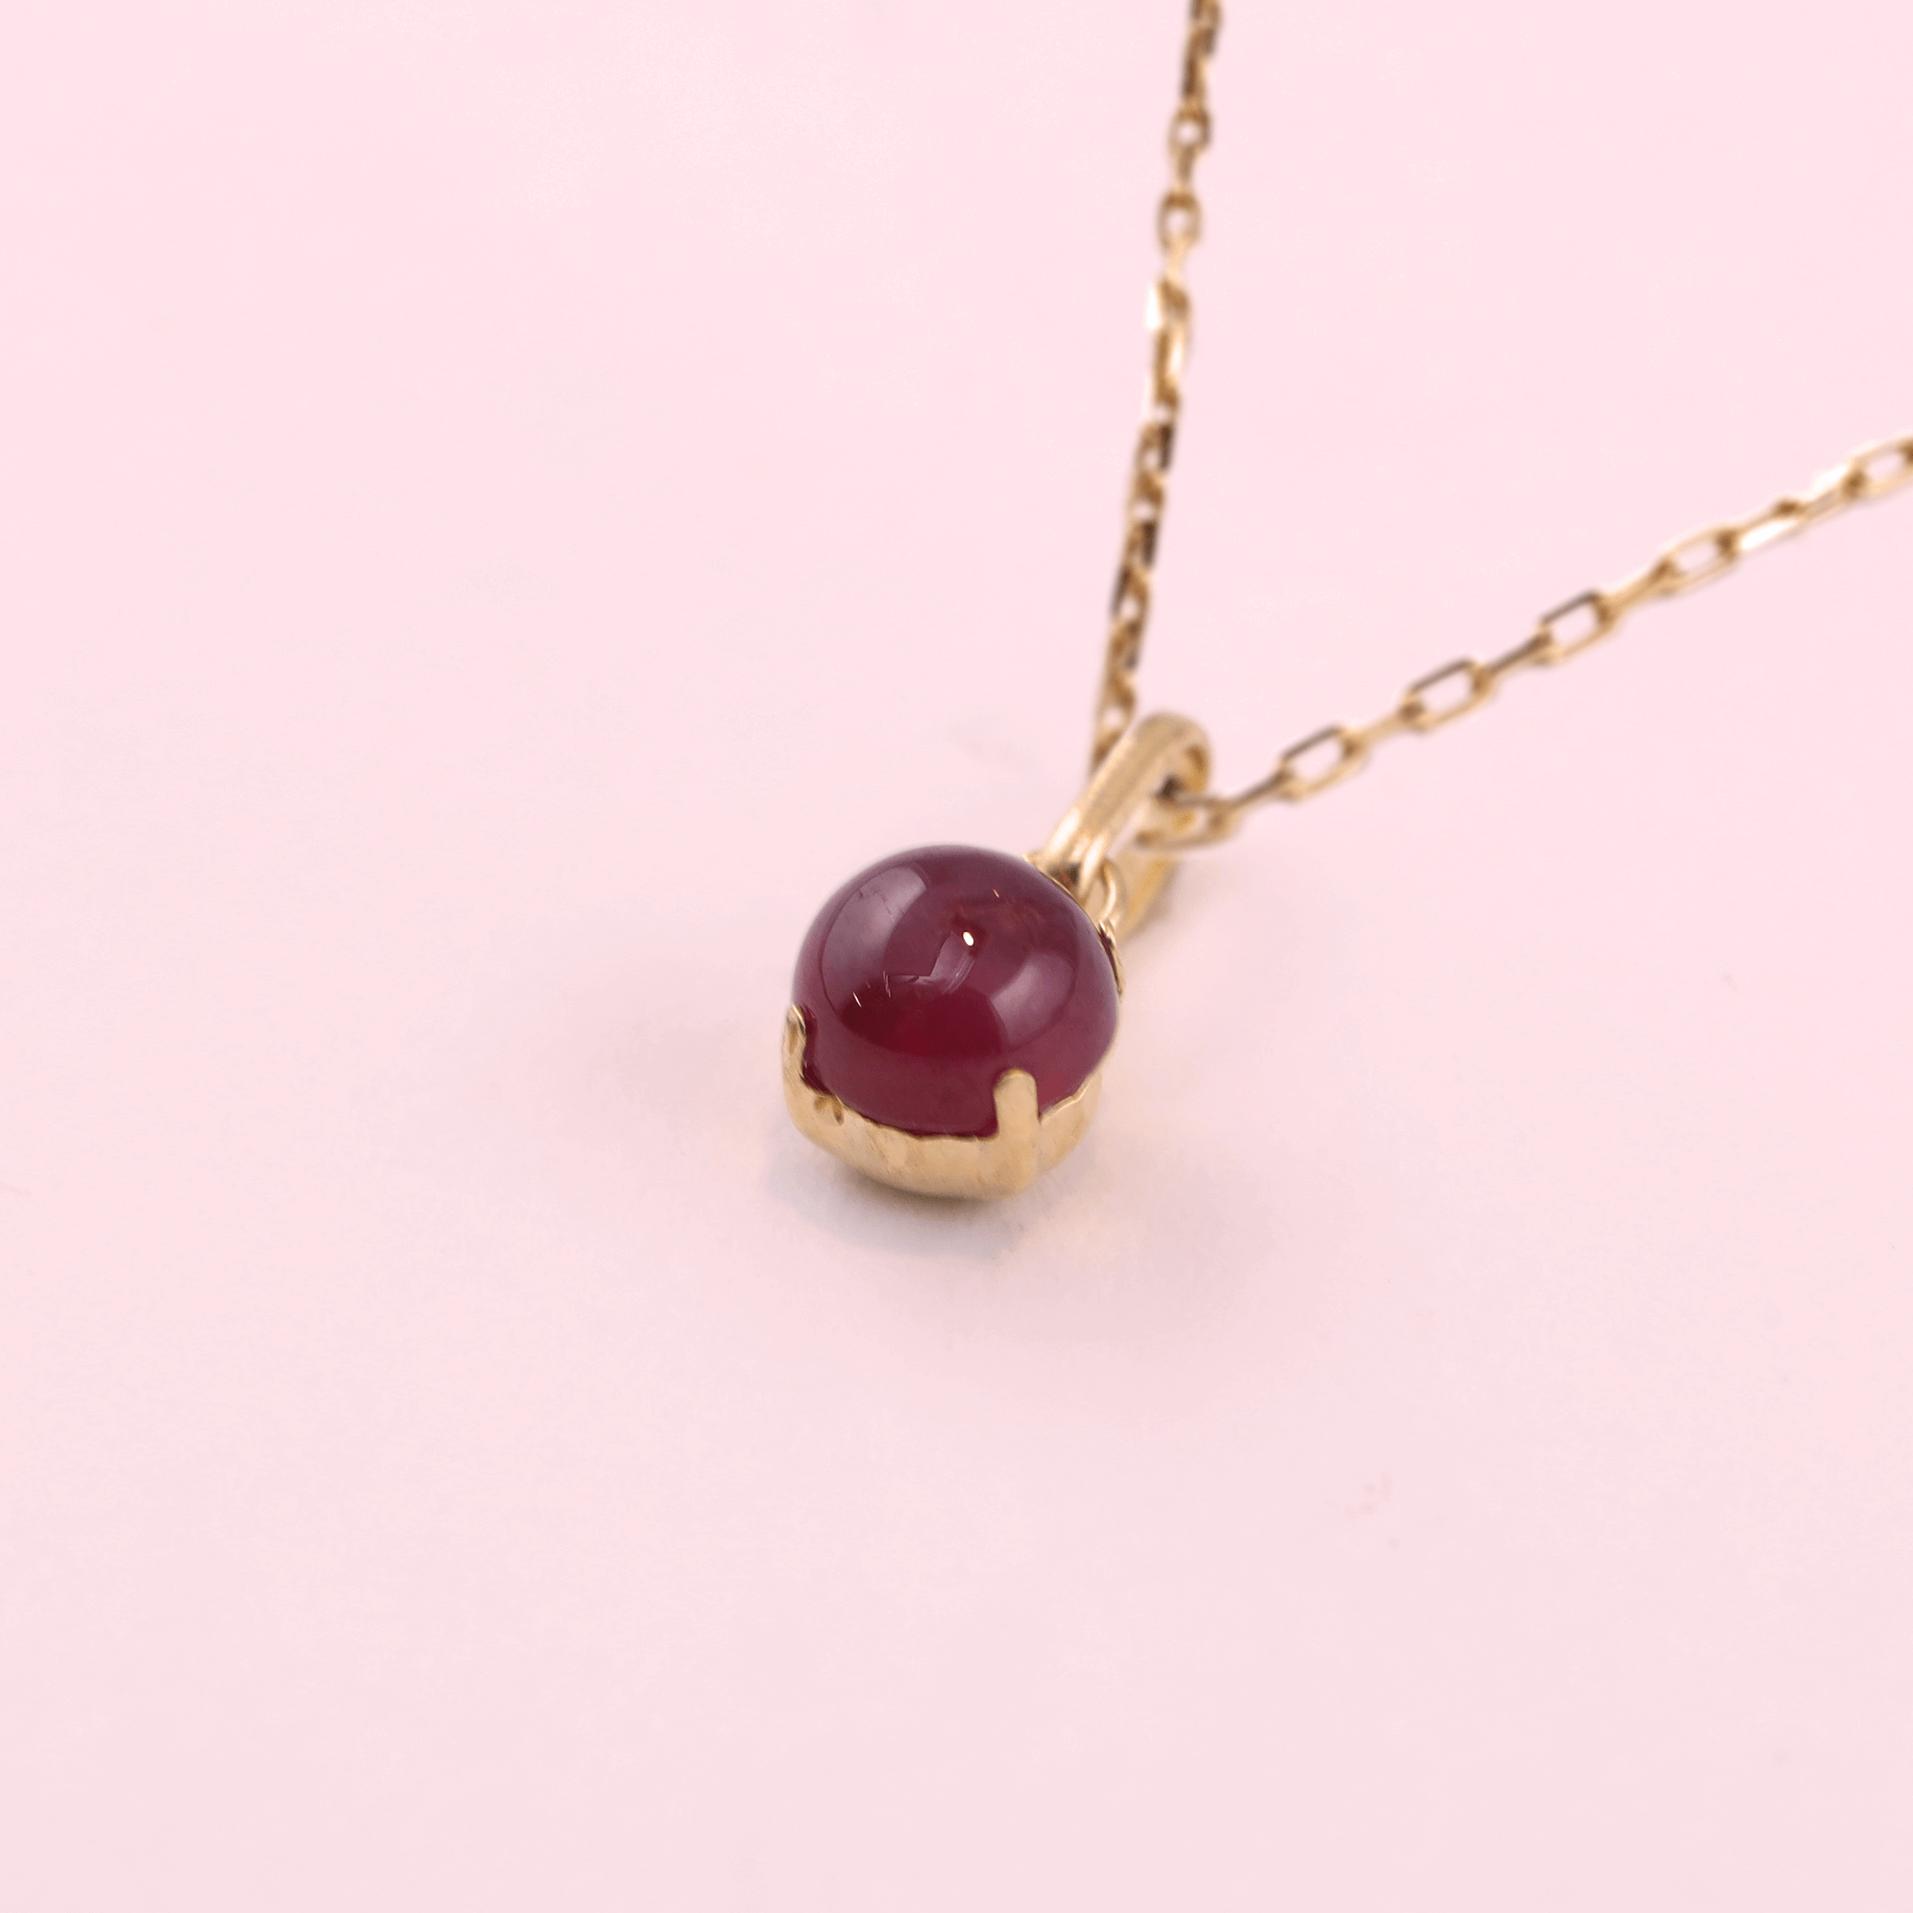 Pendant Head - Ruby / Sapphire / Emerald